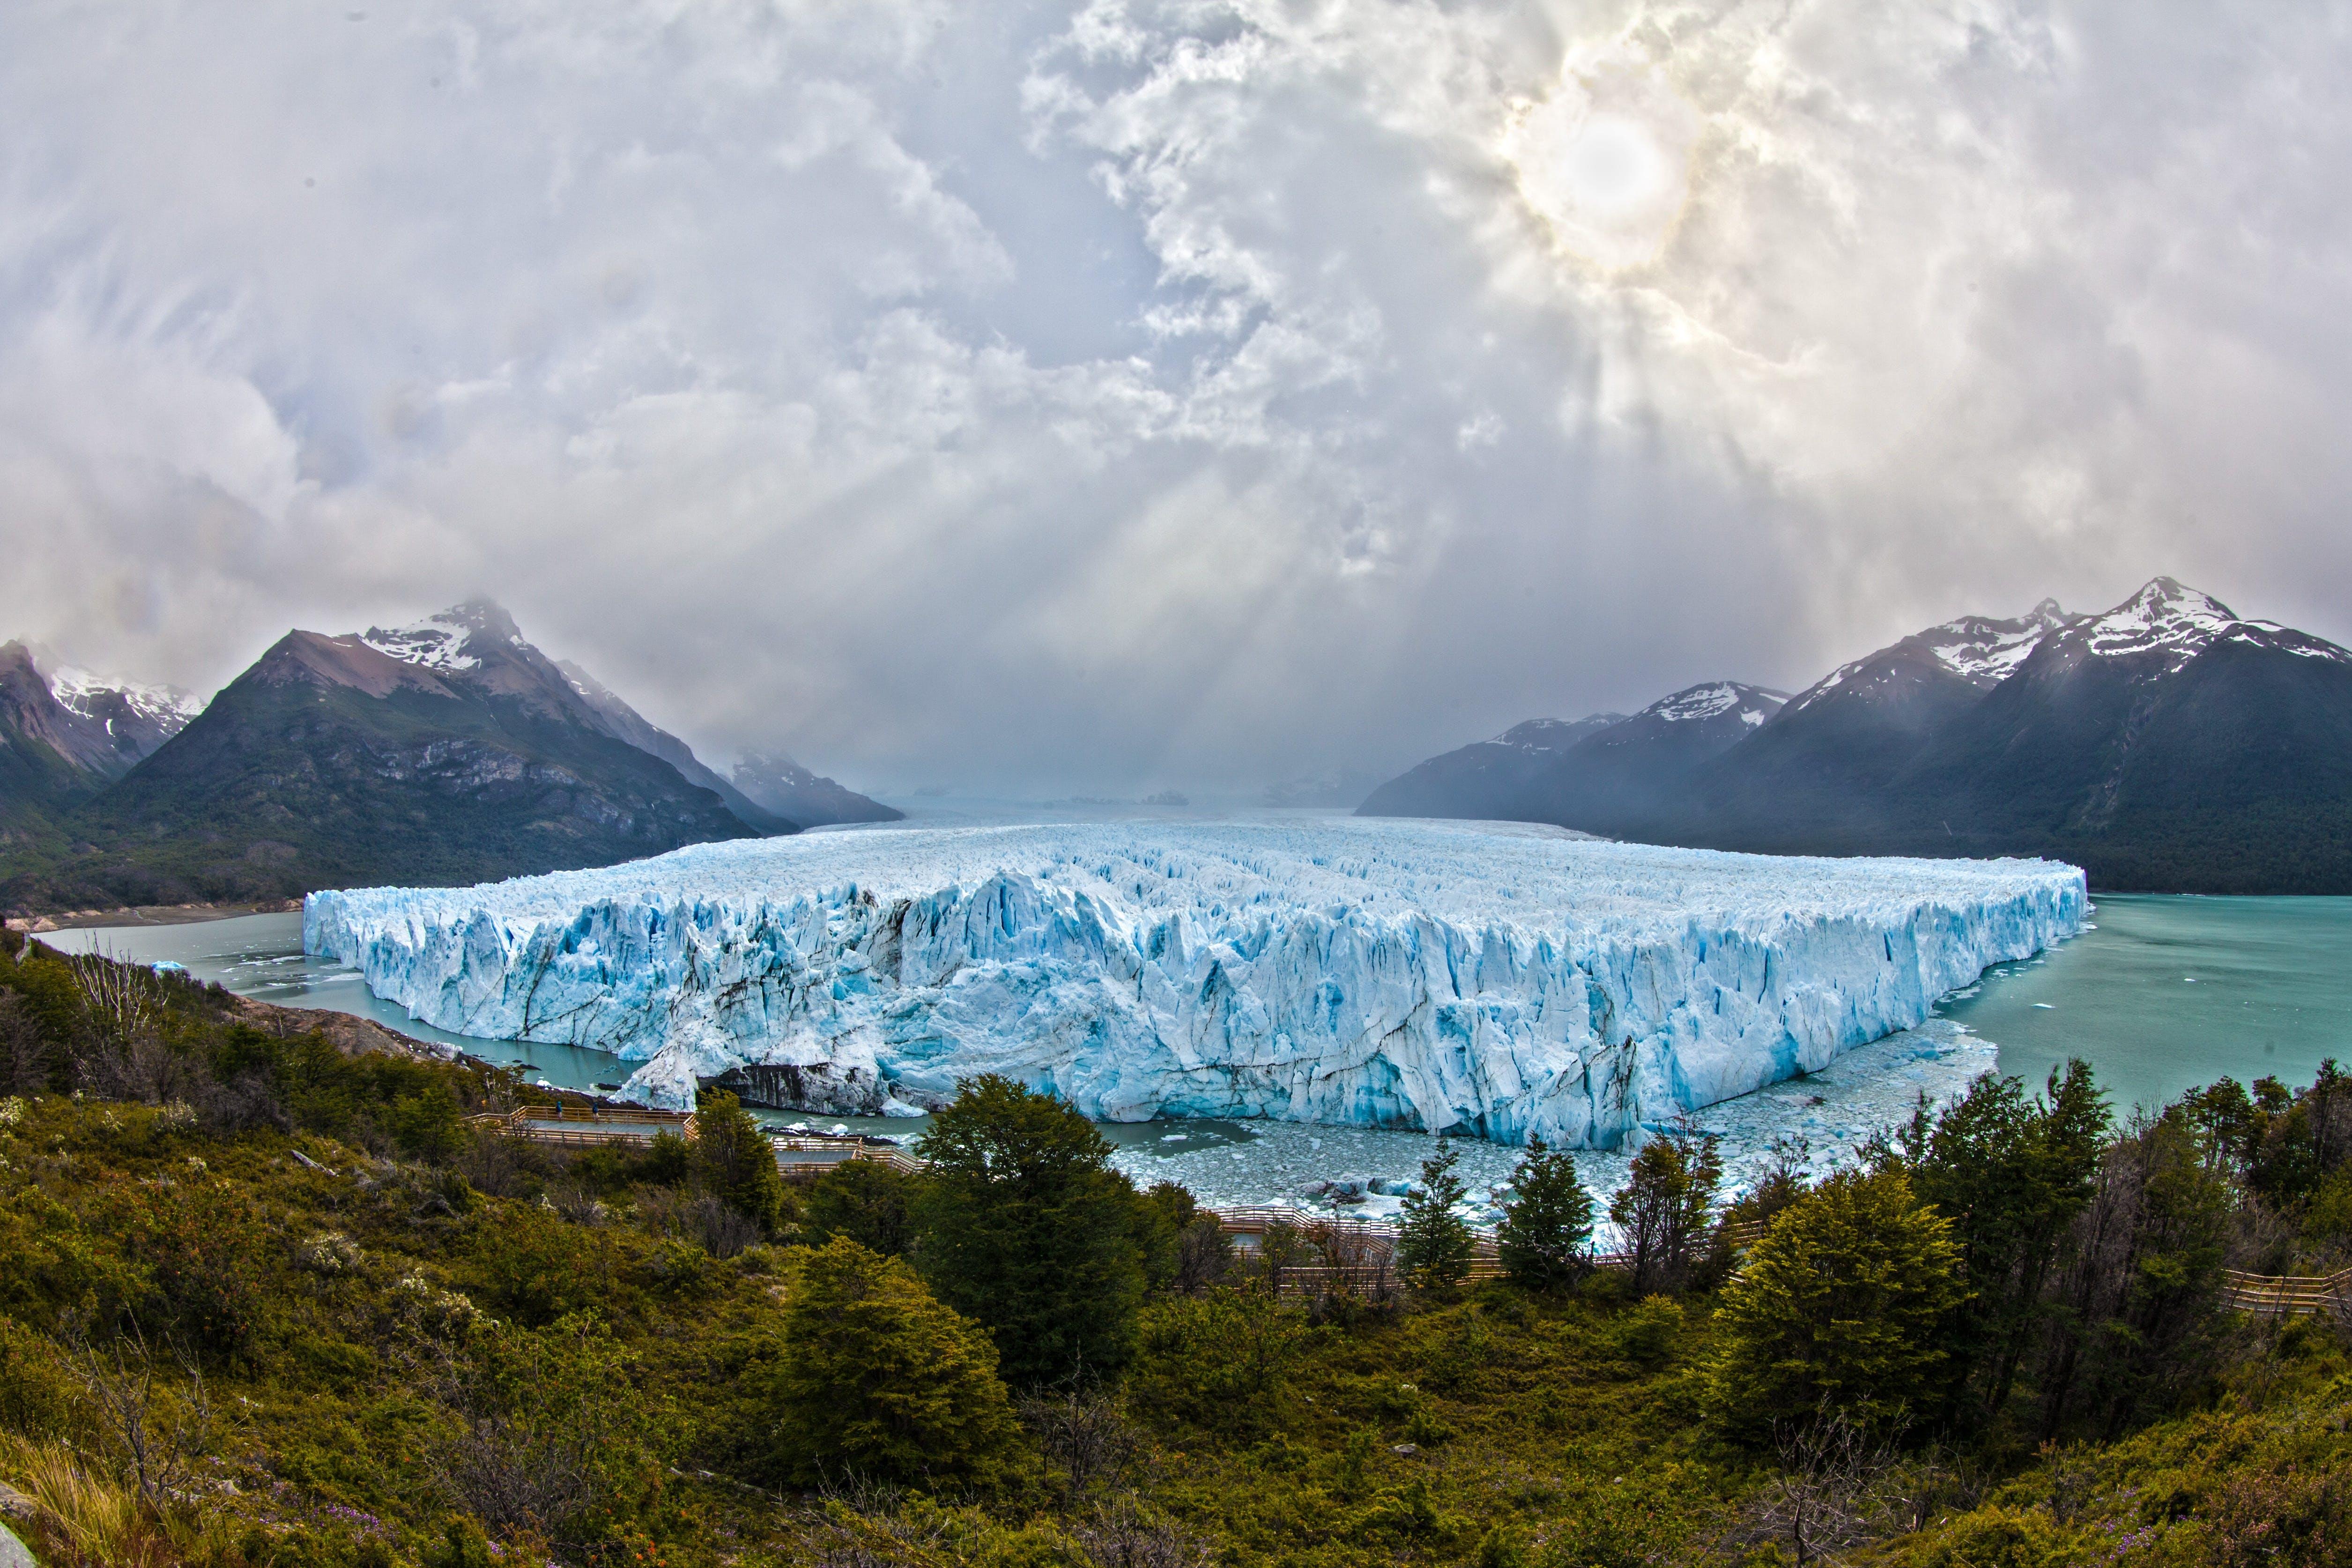 Iceberg Near Mountain Ranges